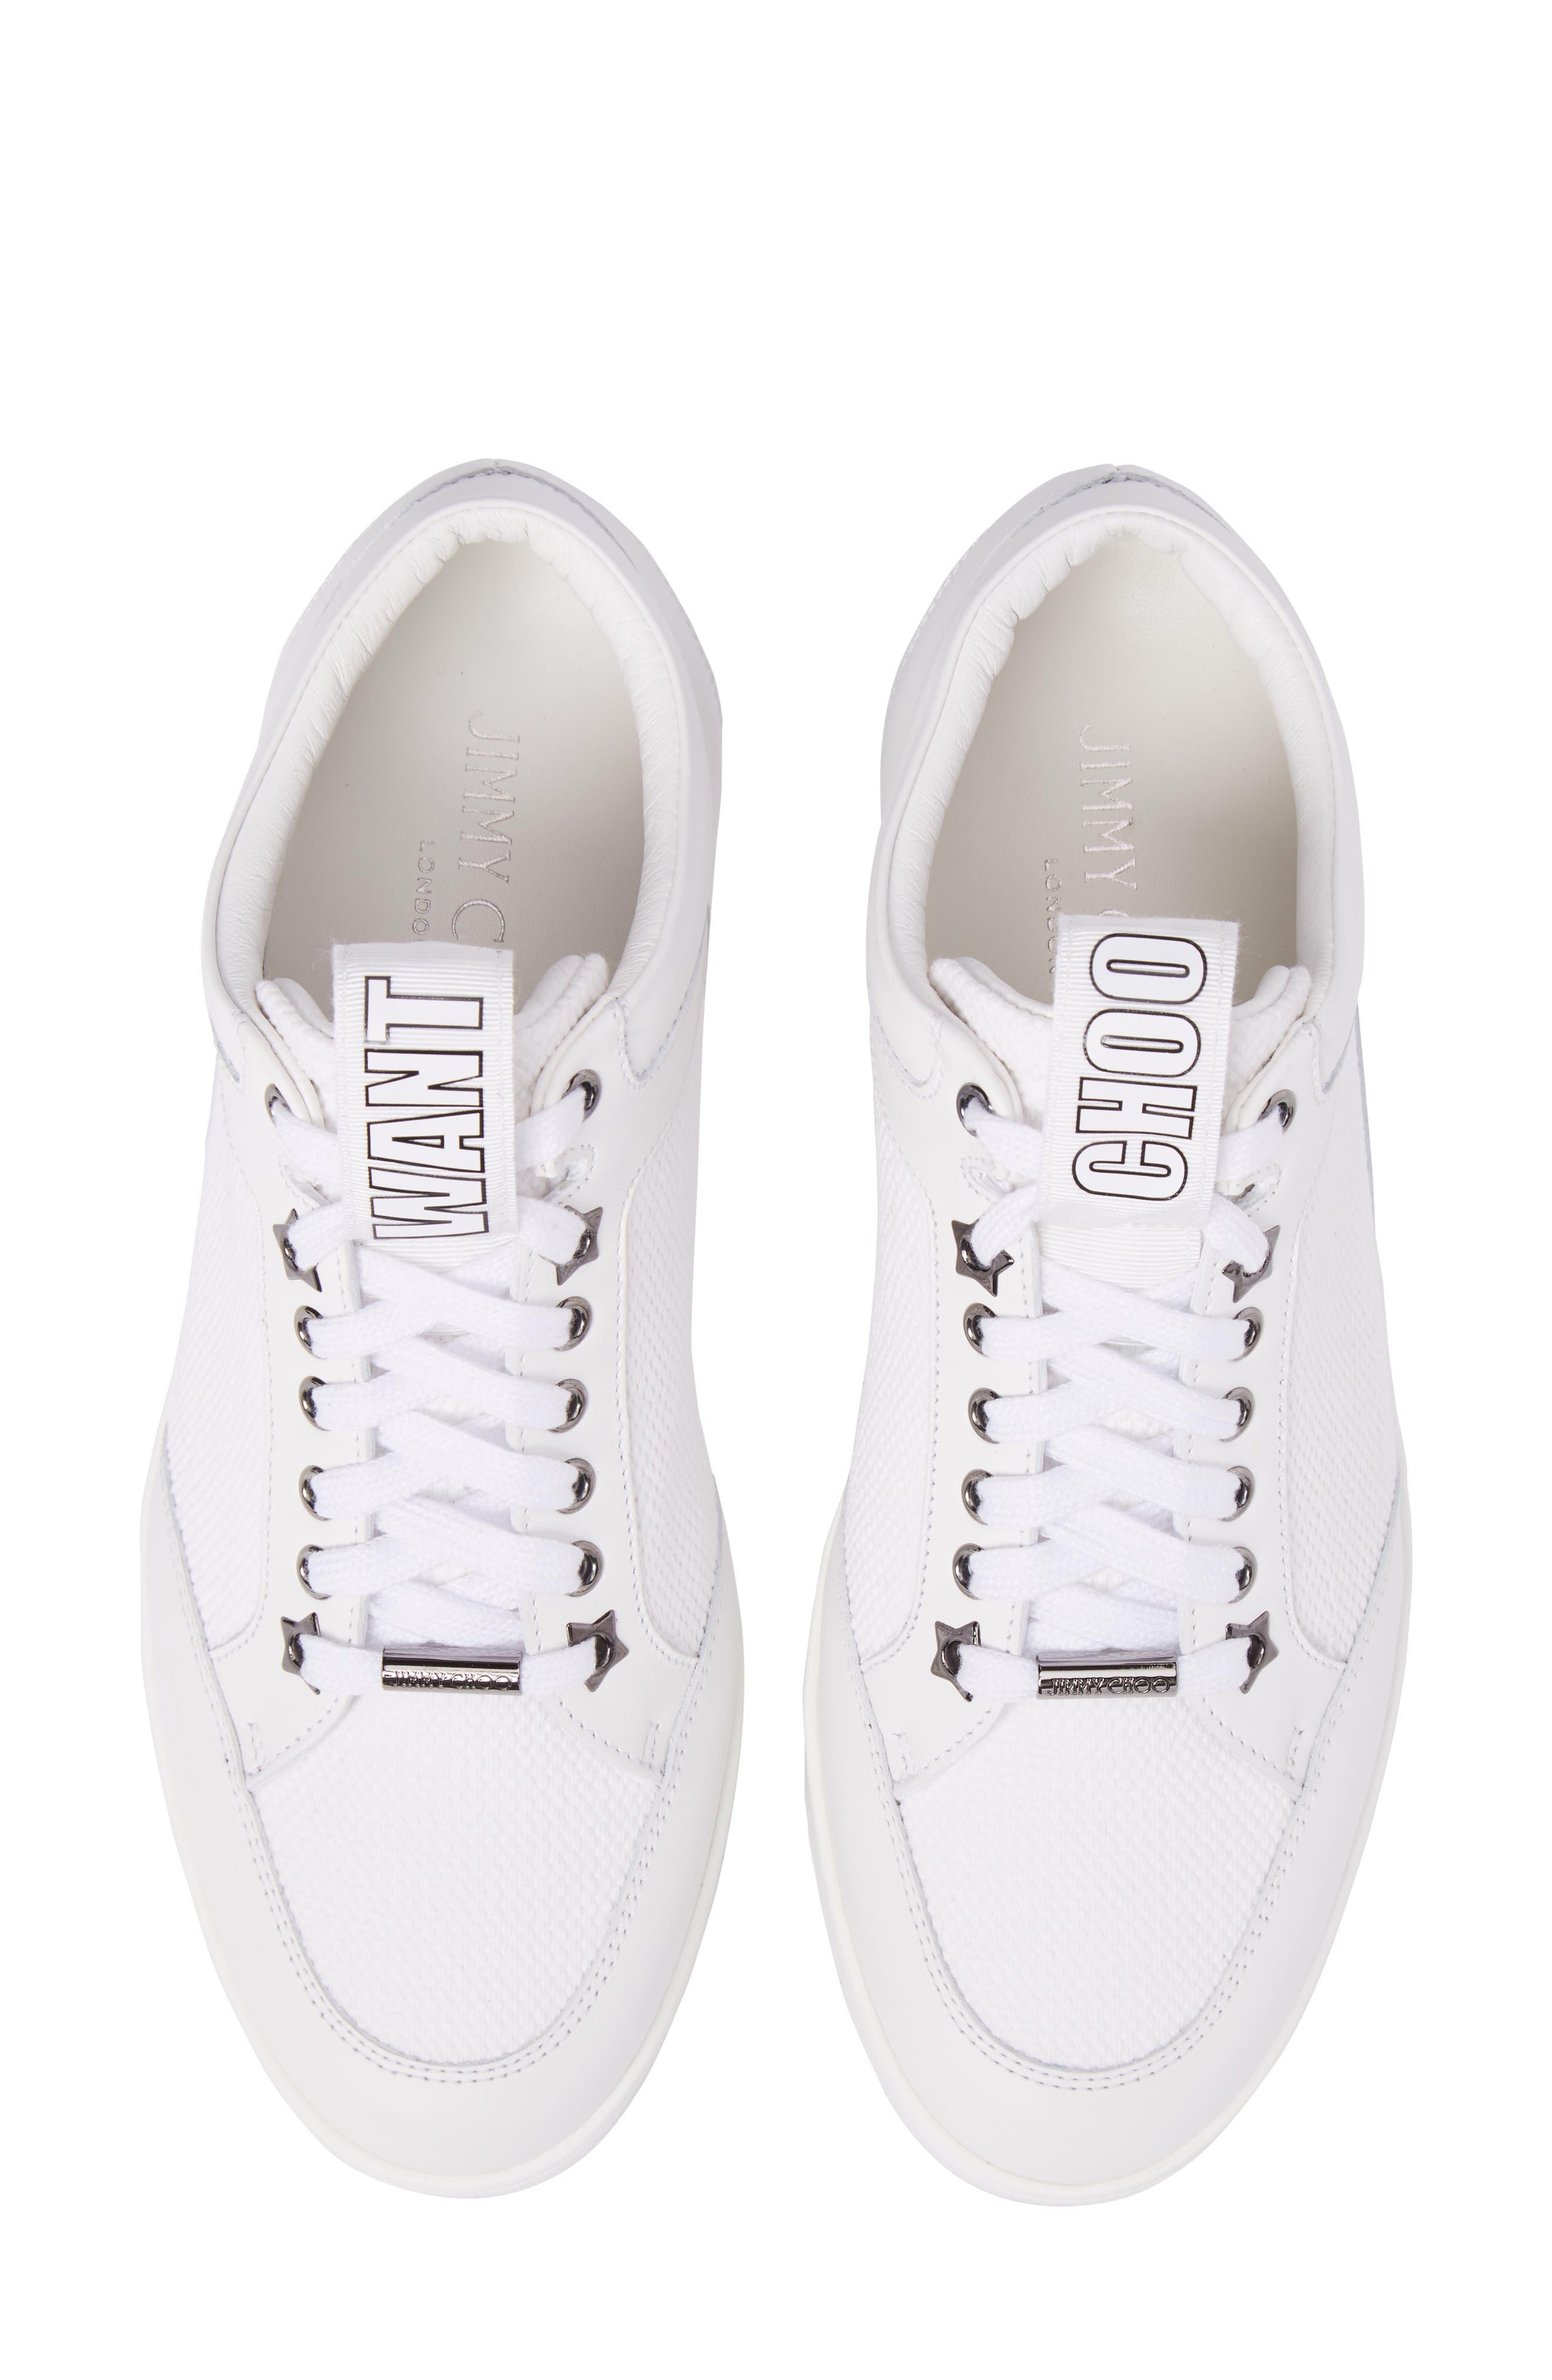 Alternate Image 1 Selected - Jimmy Choo Miami Mid Top Sneaker (Women)